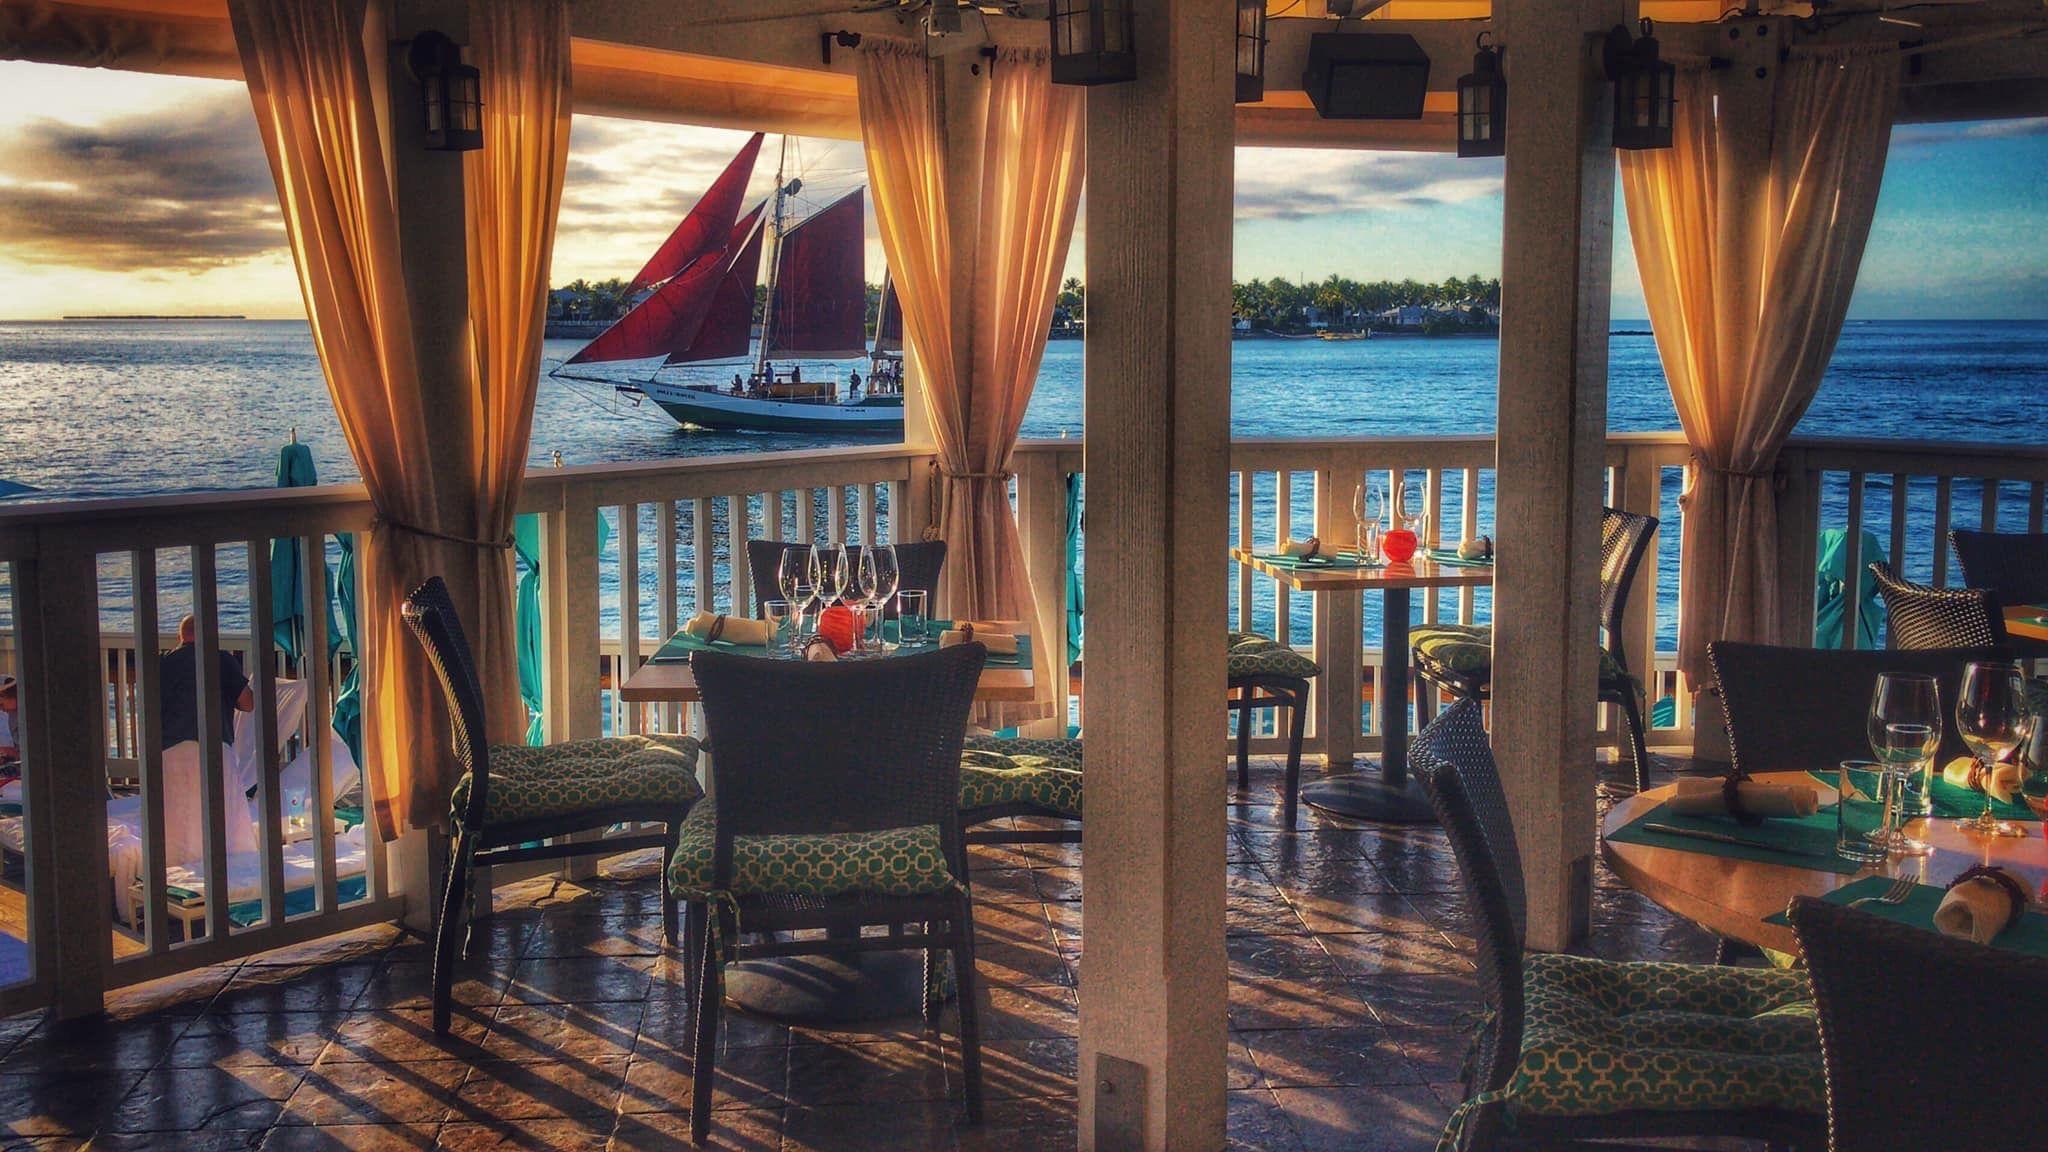 Intip Tips Booking Café di Keywest USA